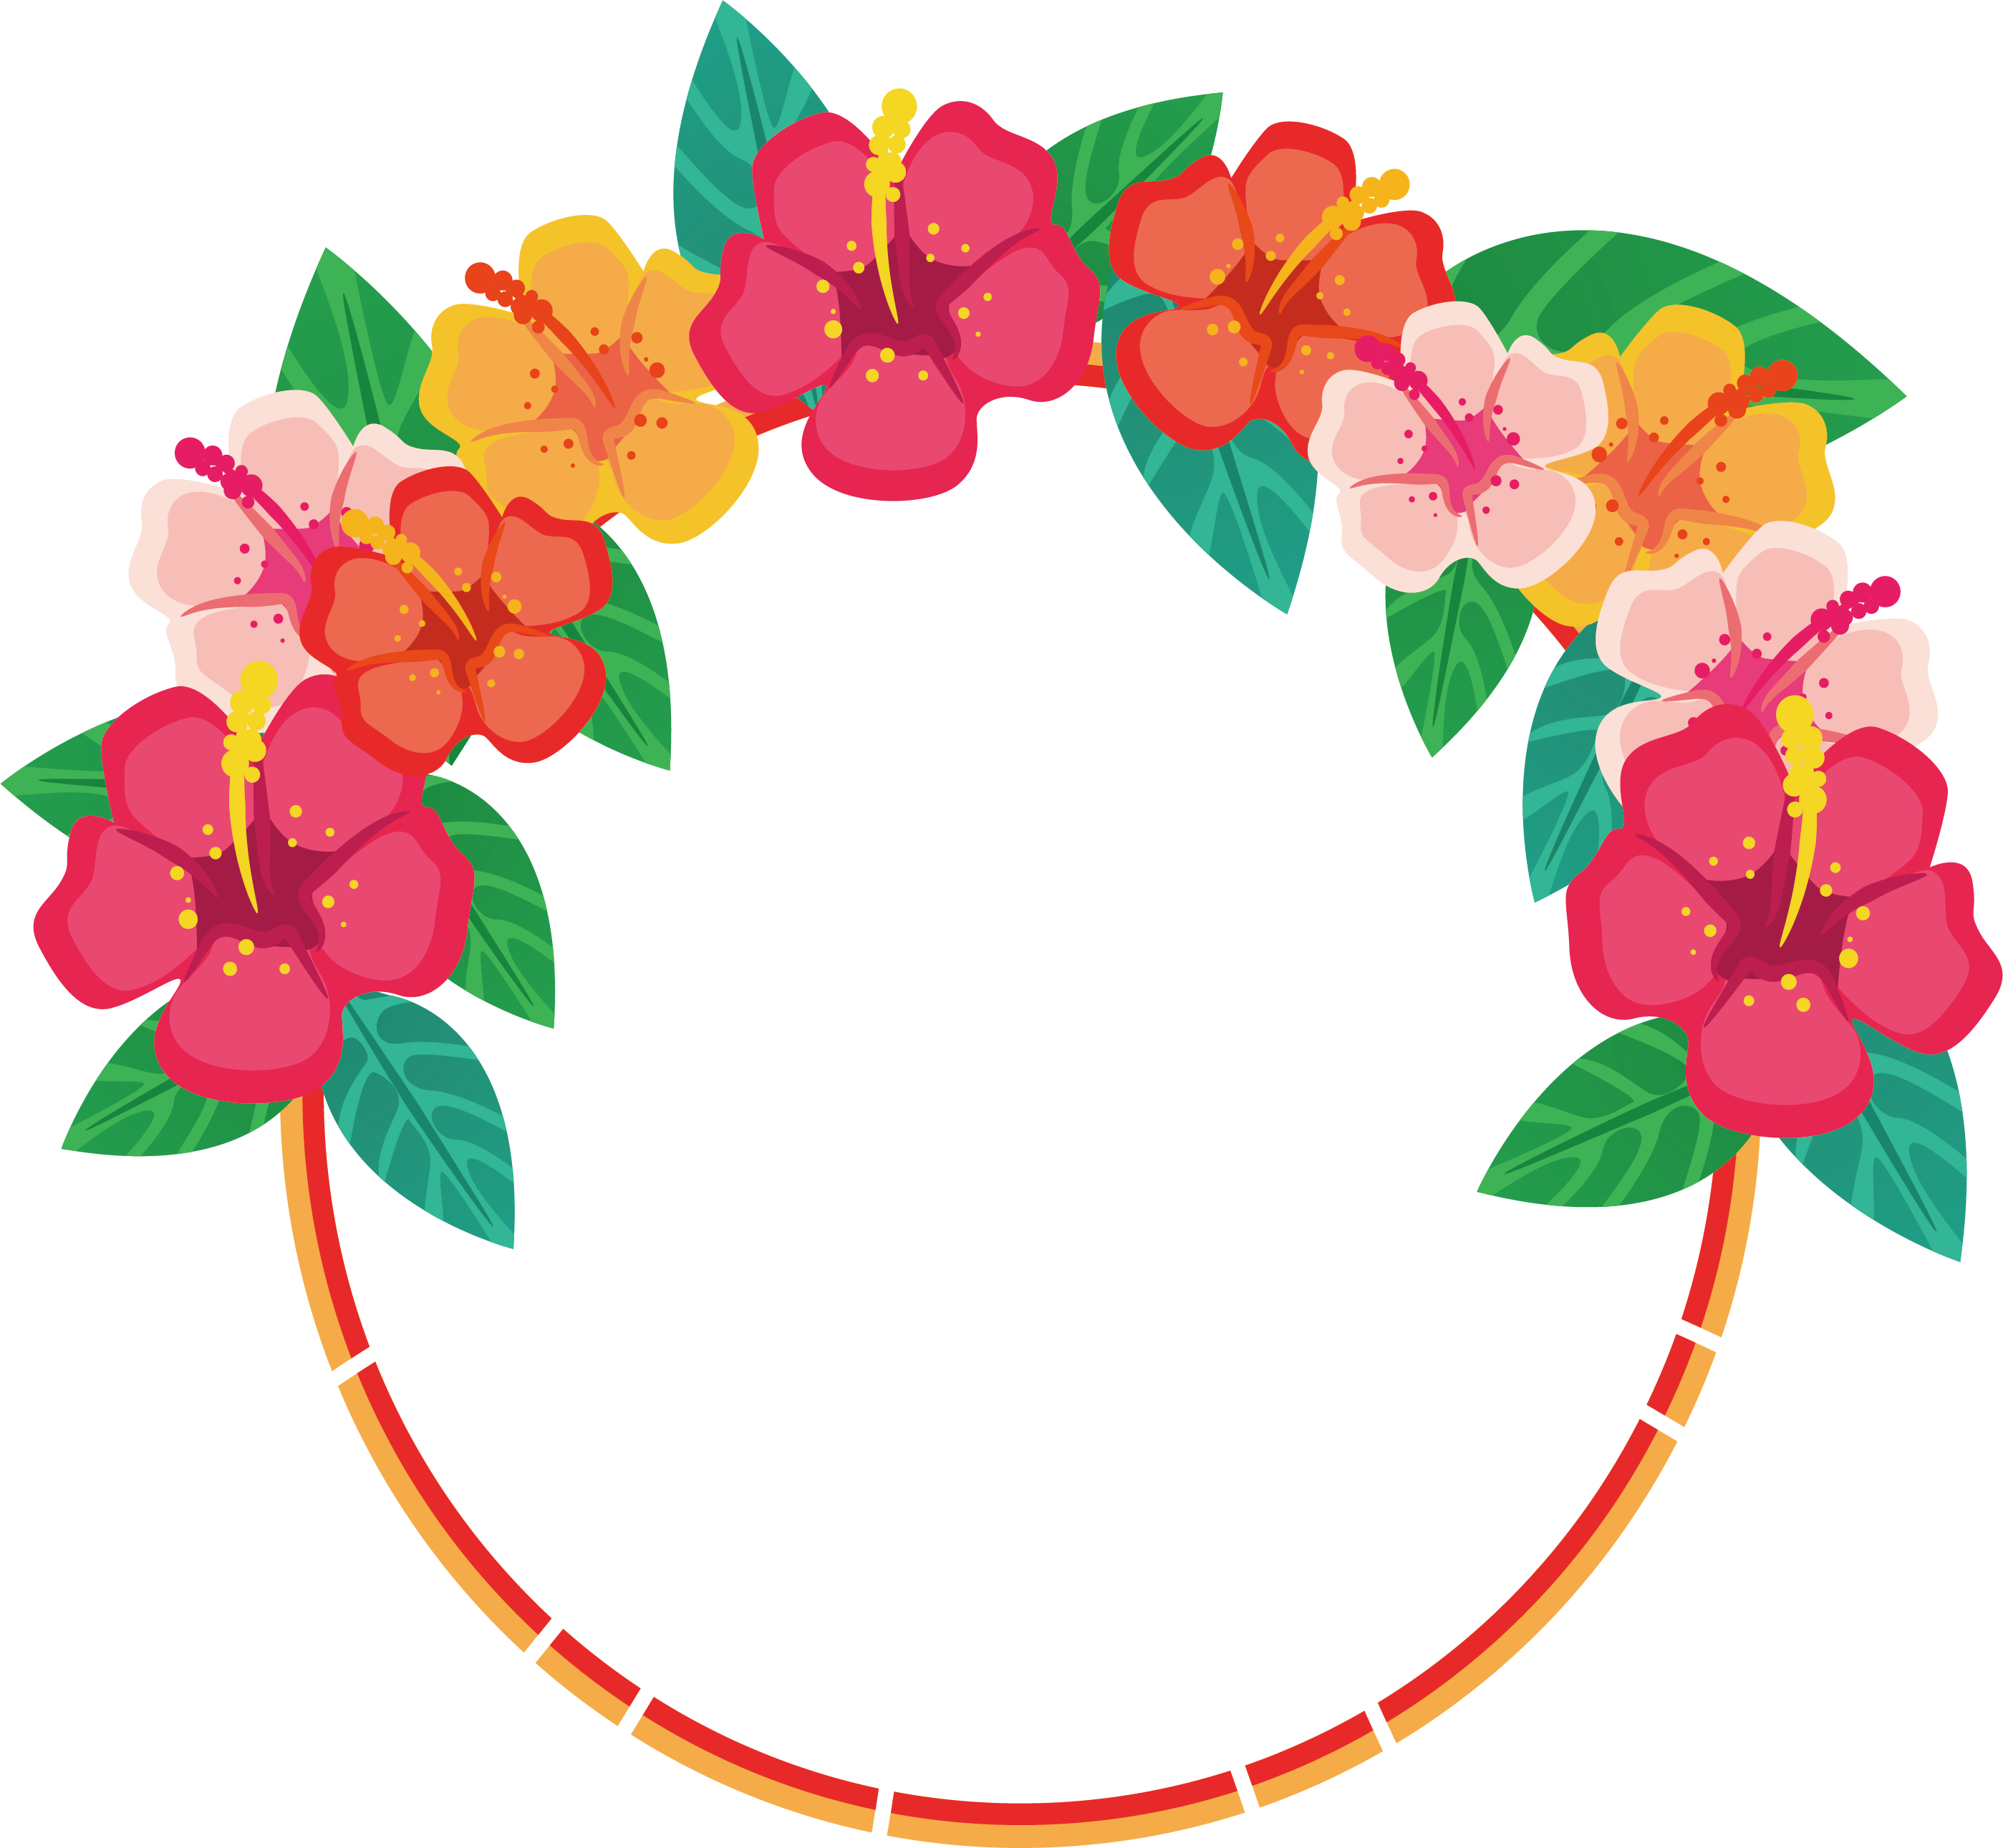 Transparent flower clipart - Flower Floral Design Download Clip Art - Flower Round Border Designs